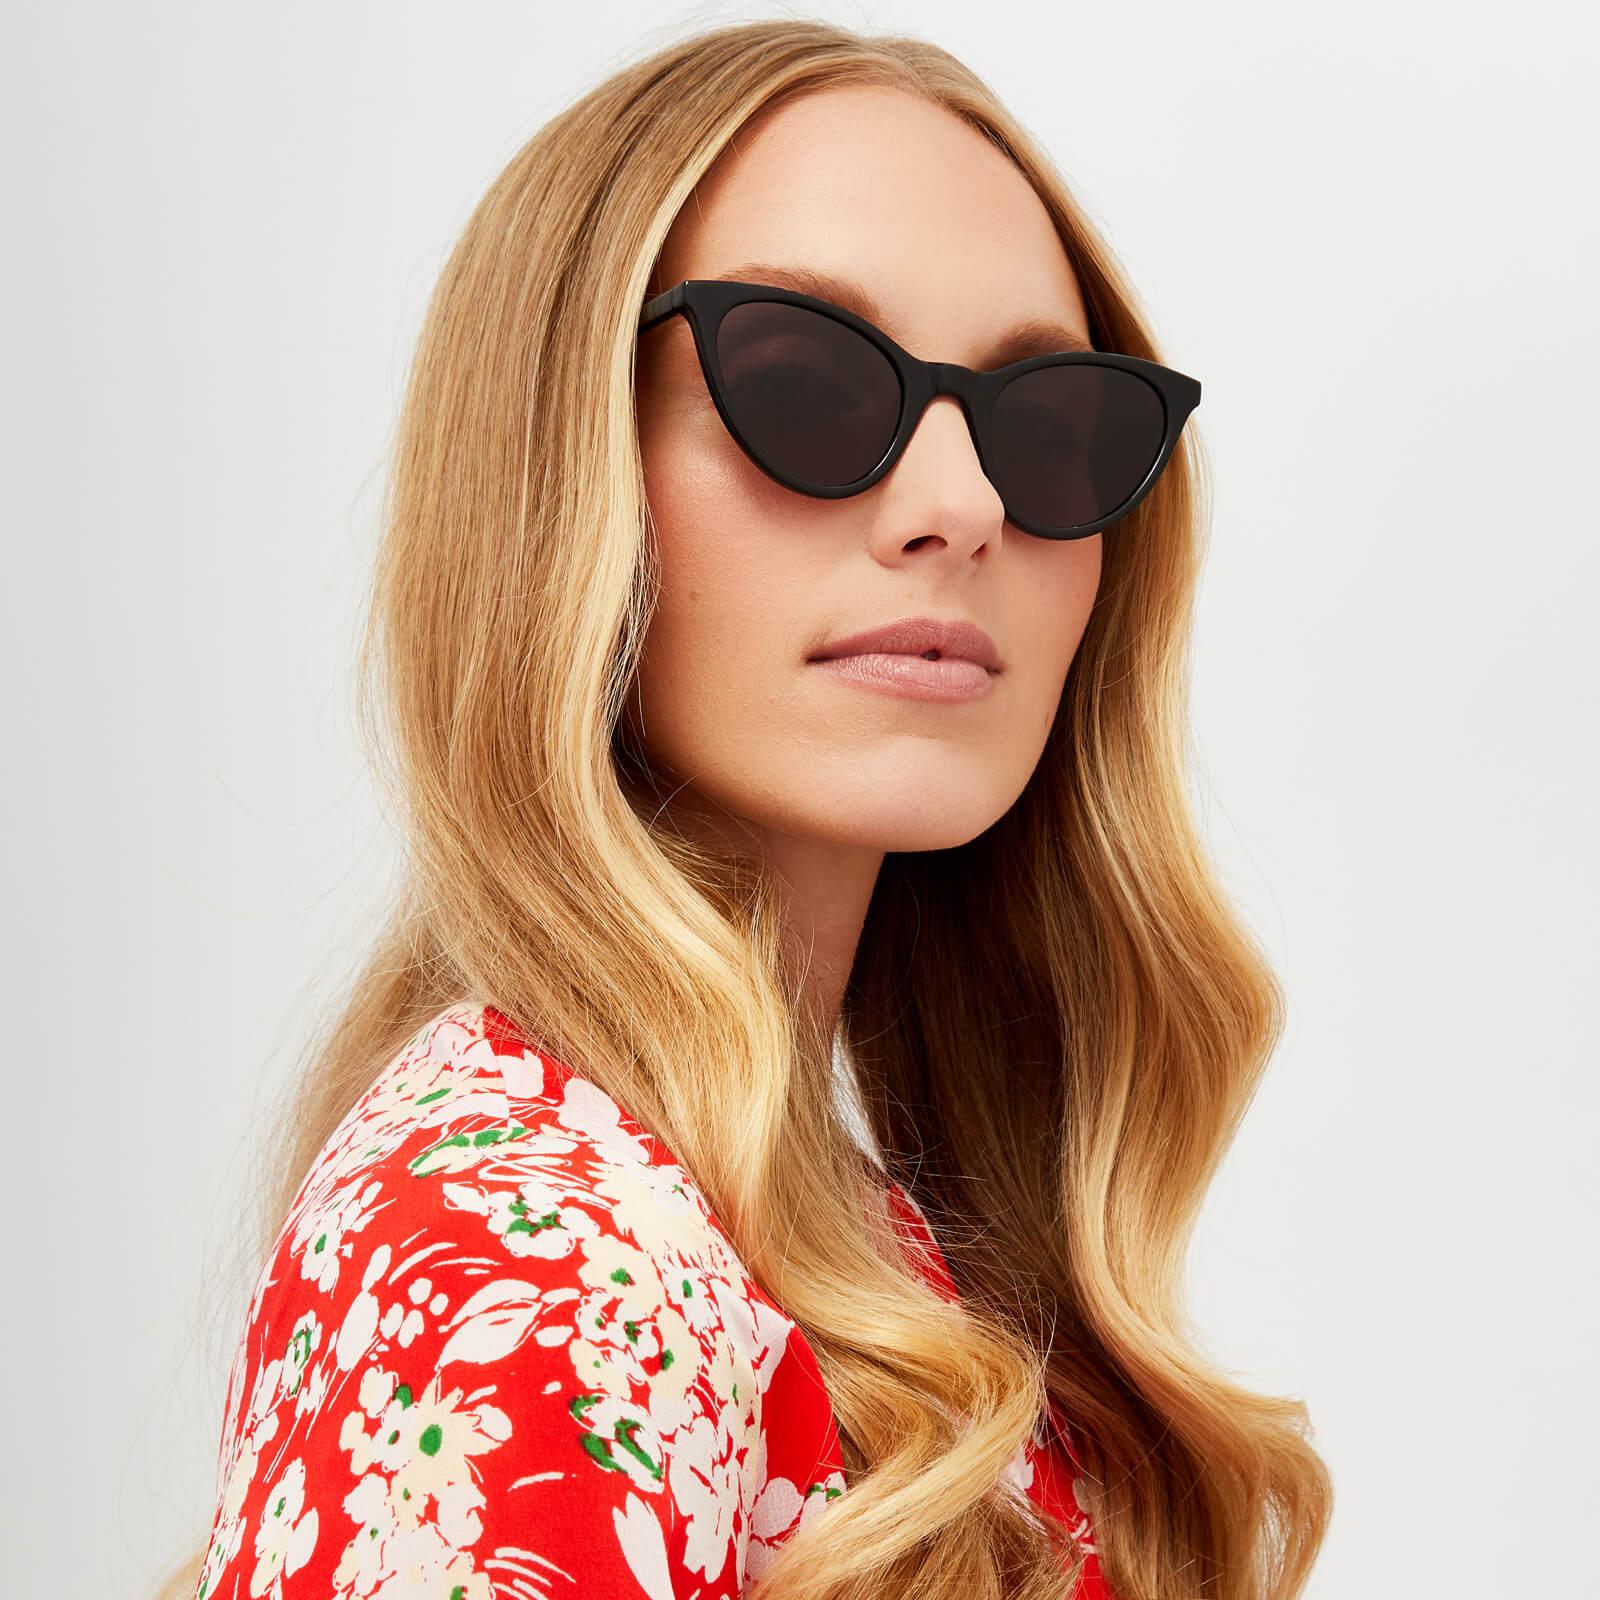 d2428936b McQ Alexander McQueen Women s Cat-Eye Sunglasses - Black Grey - Free UK  Delivery over £50